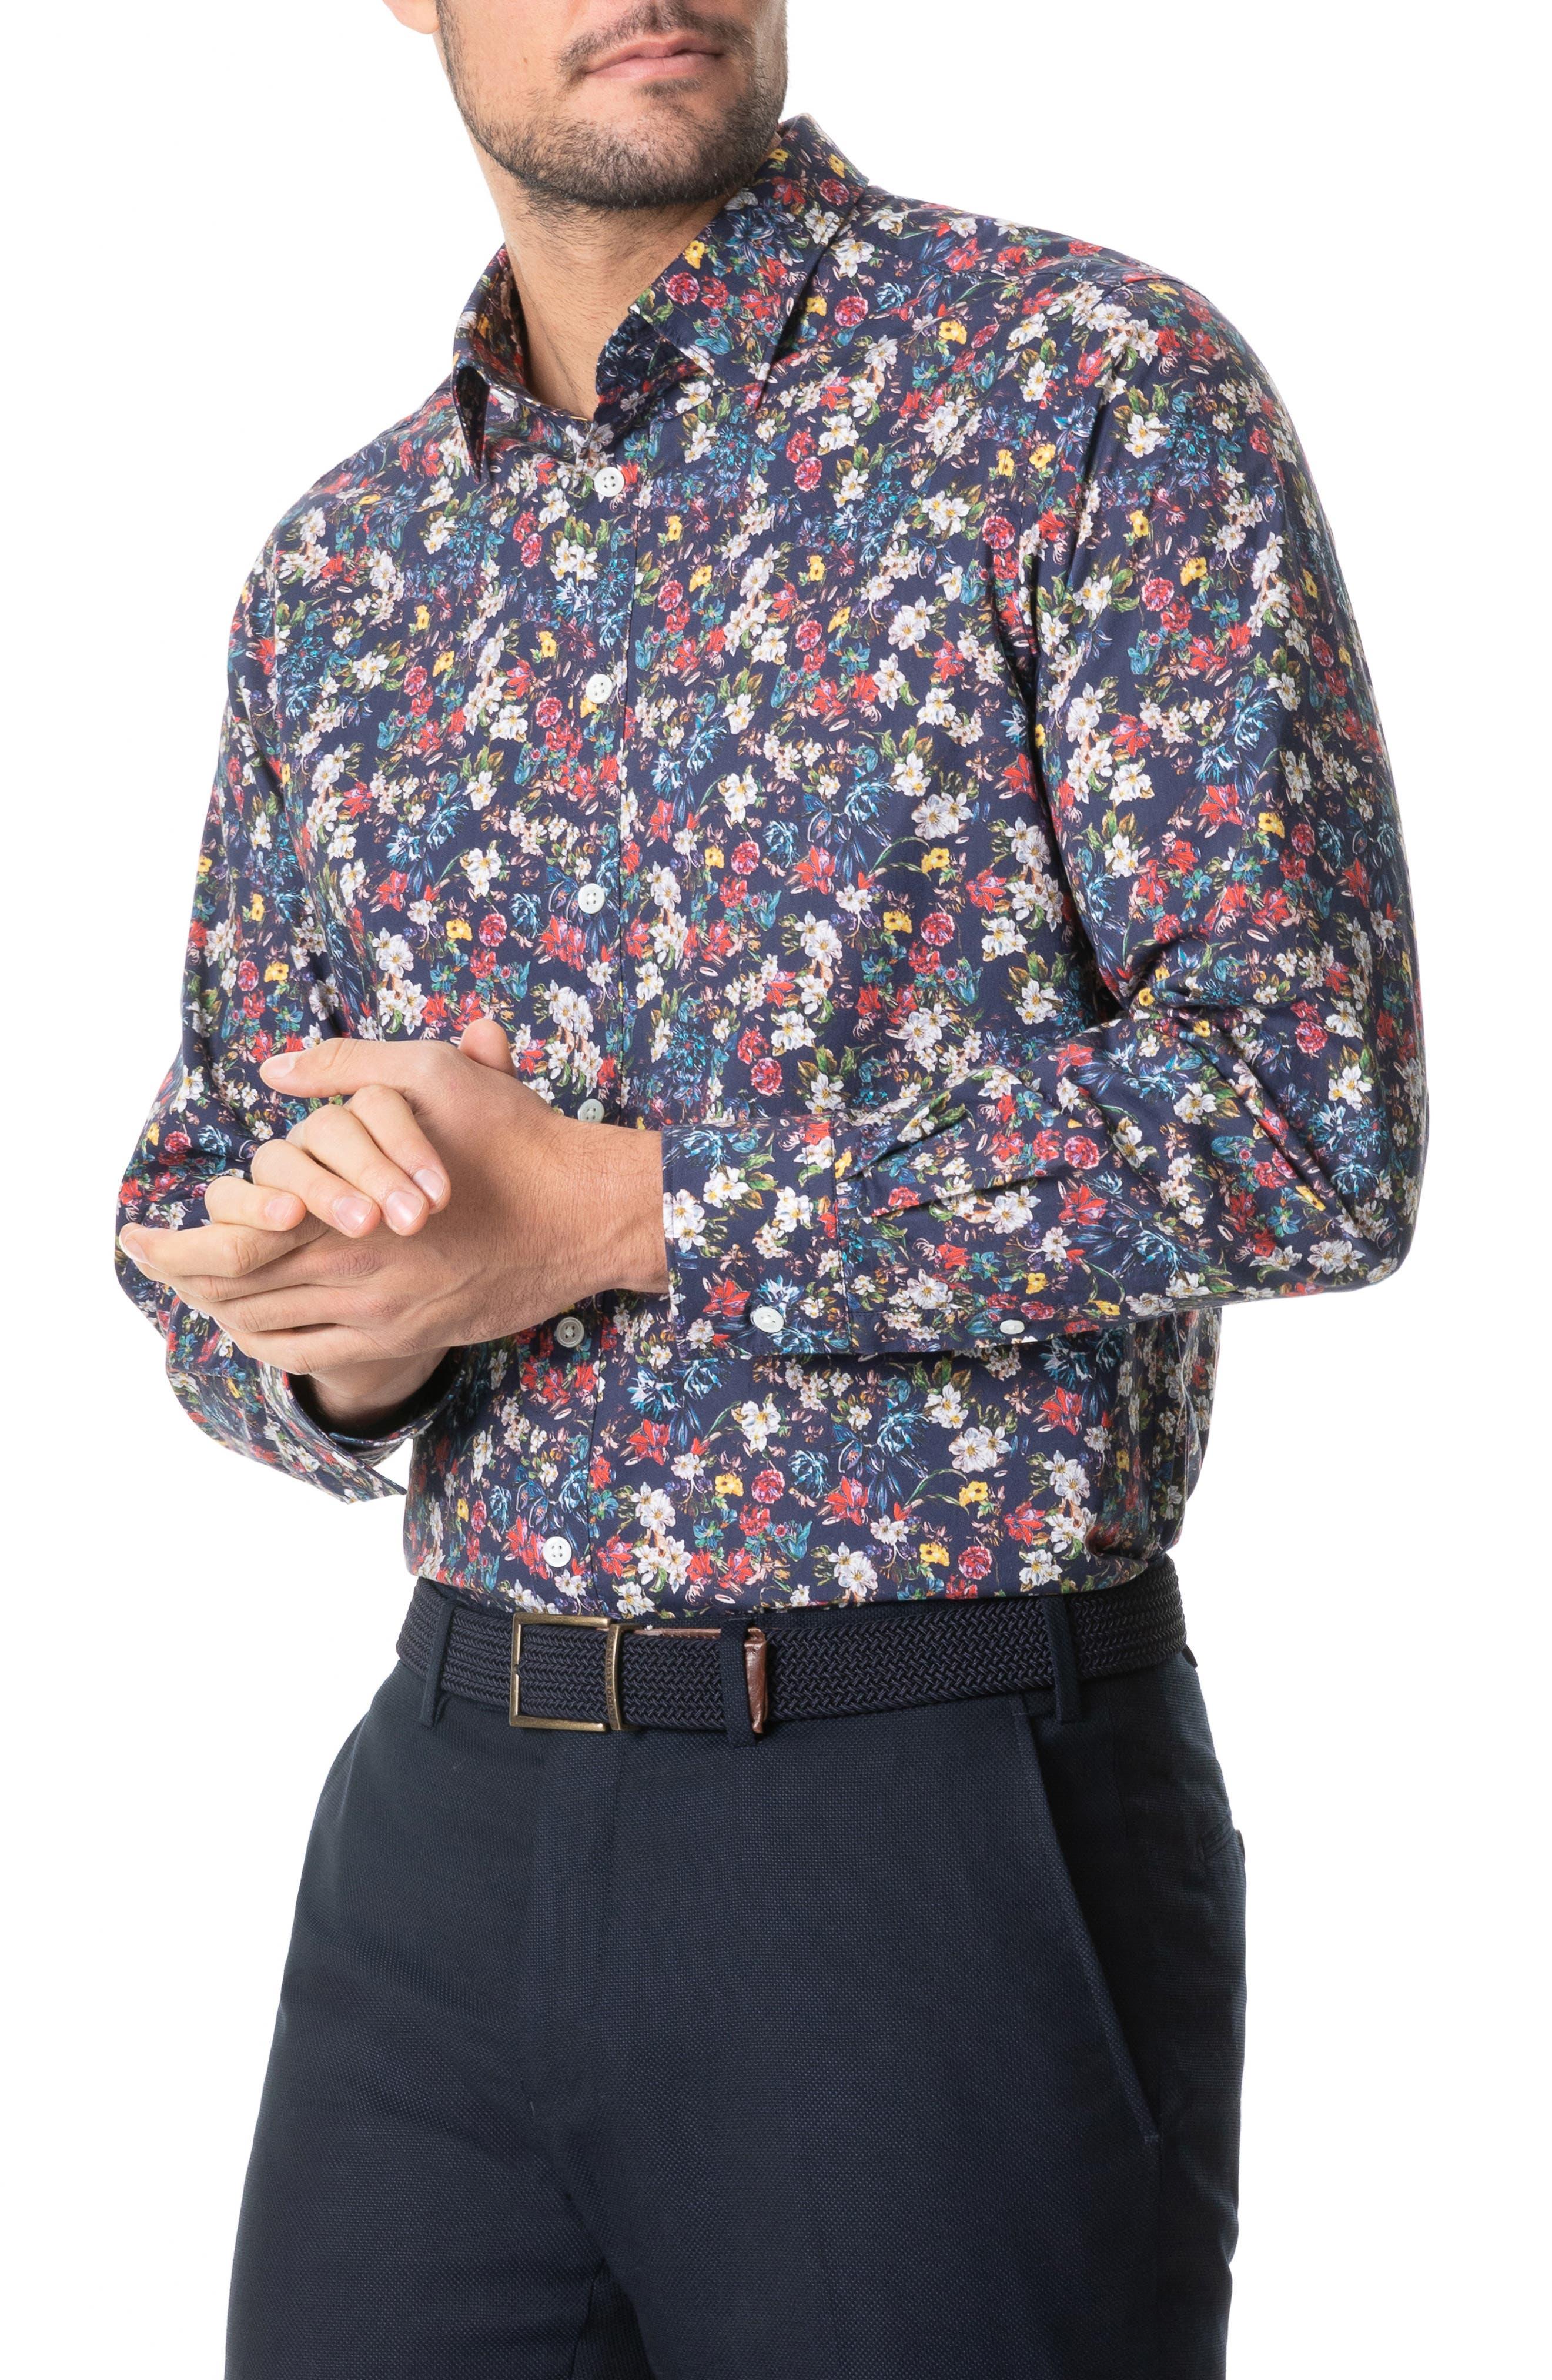 Image of RODD AND GUNN Foxton Floral Button-Up Shirt